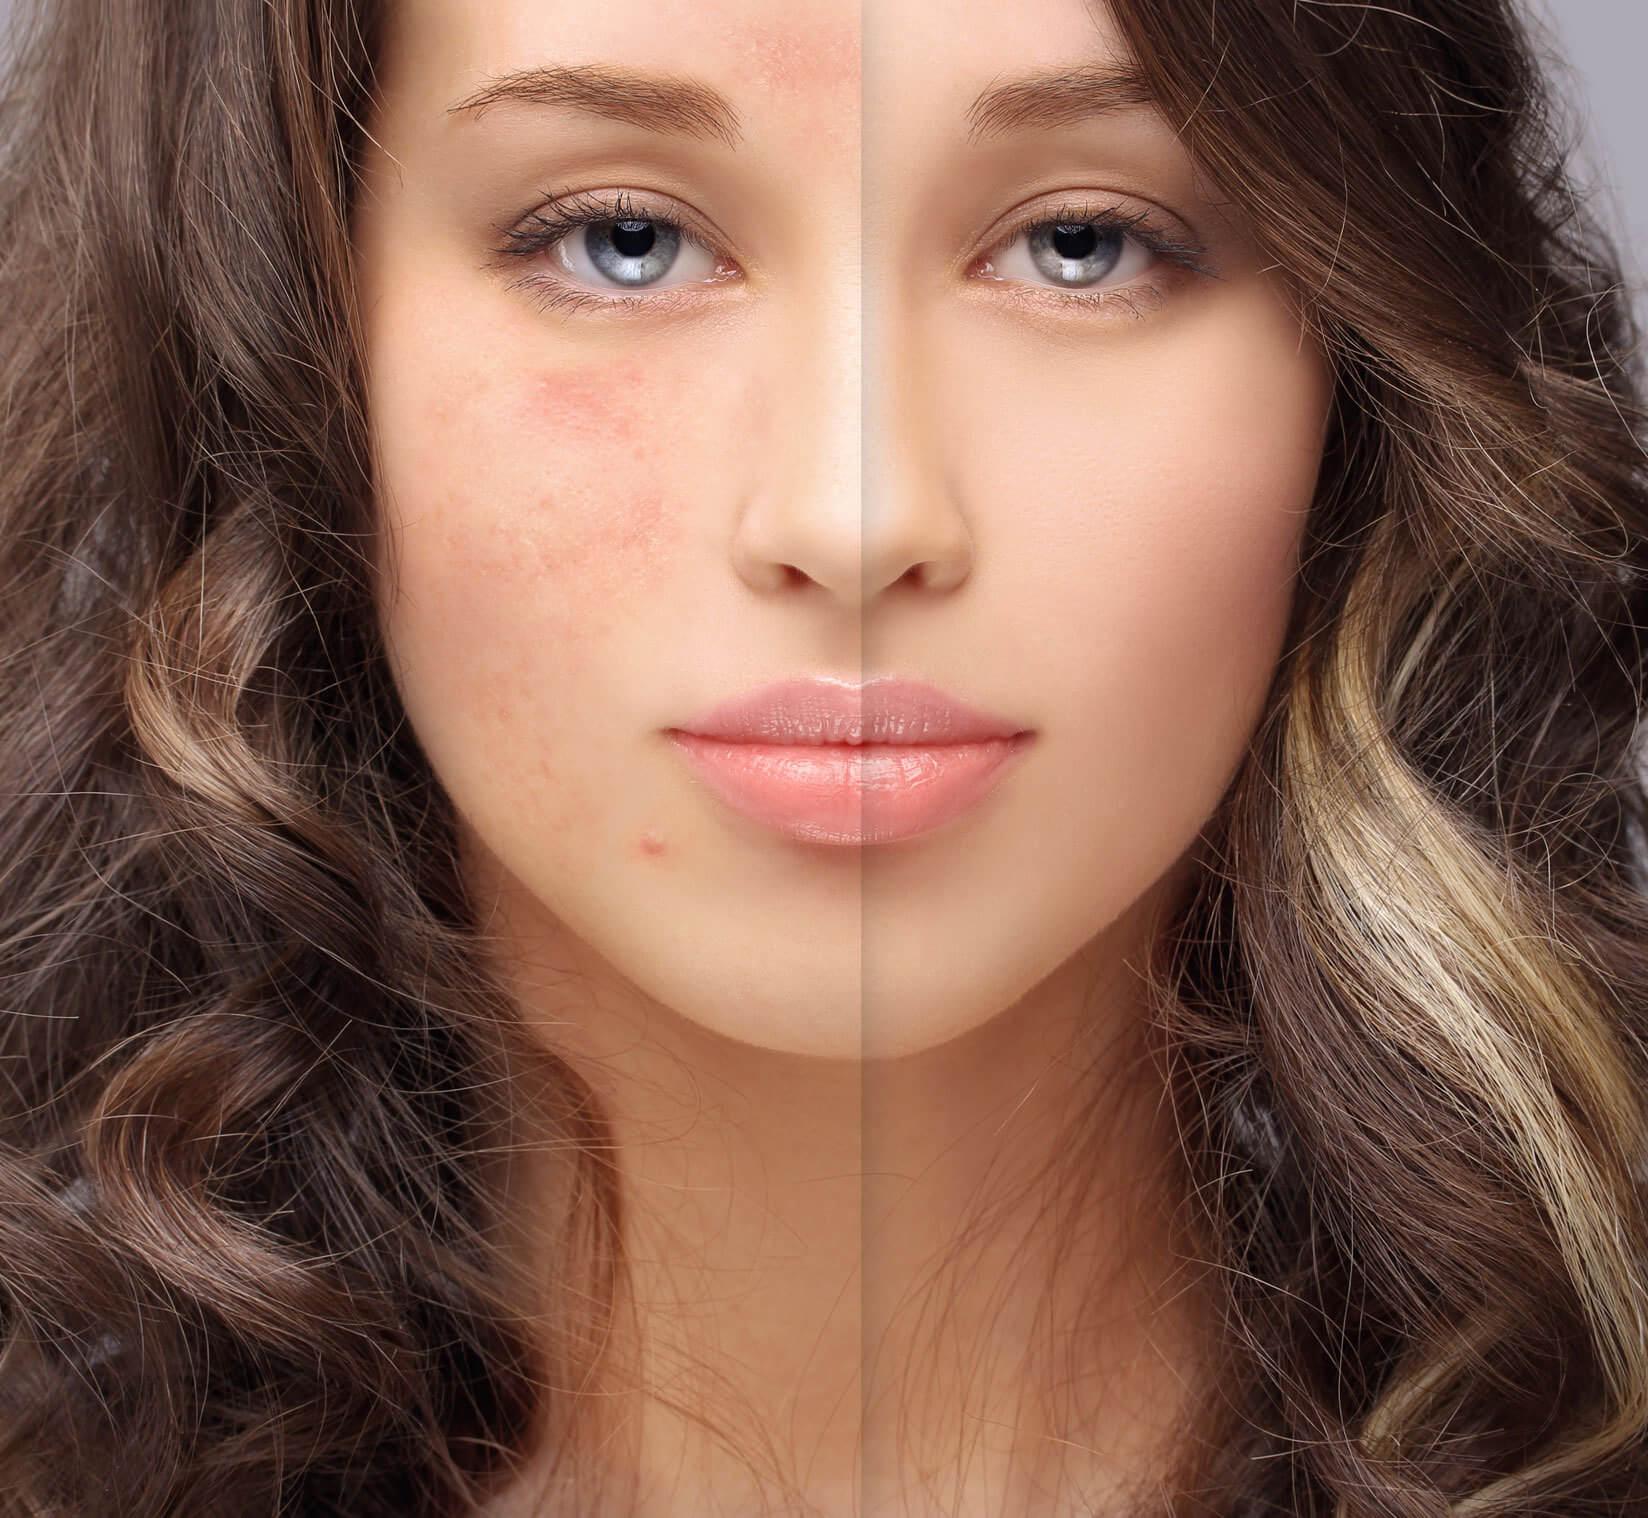 Pure Skin Professional - unreine Haut behandlung in Berlin